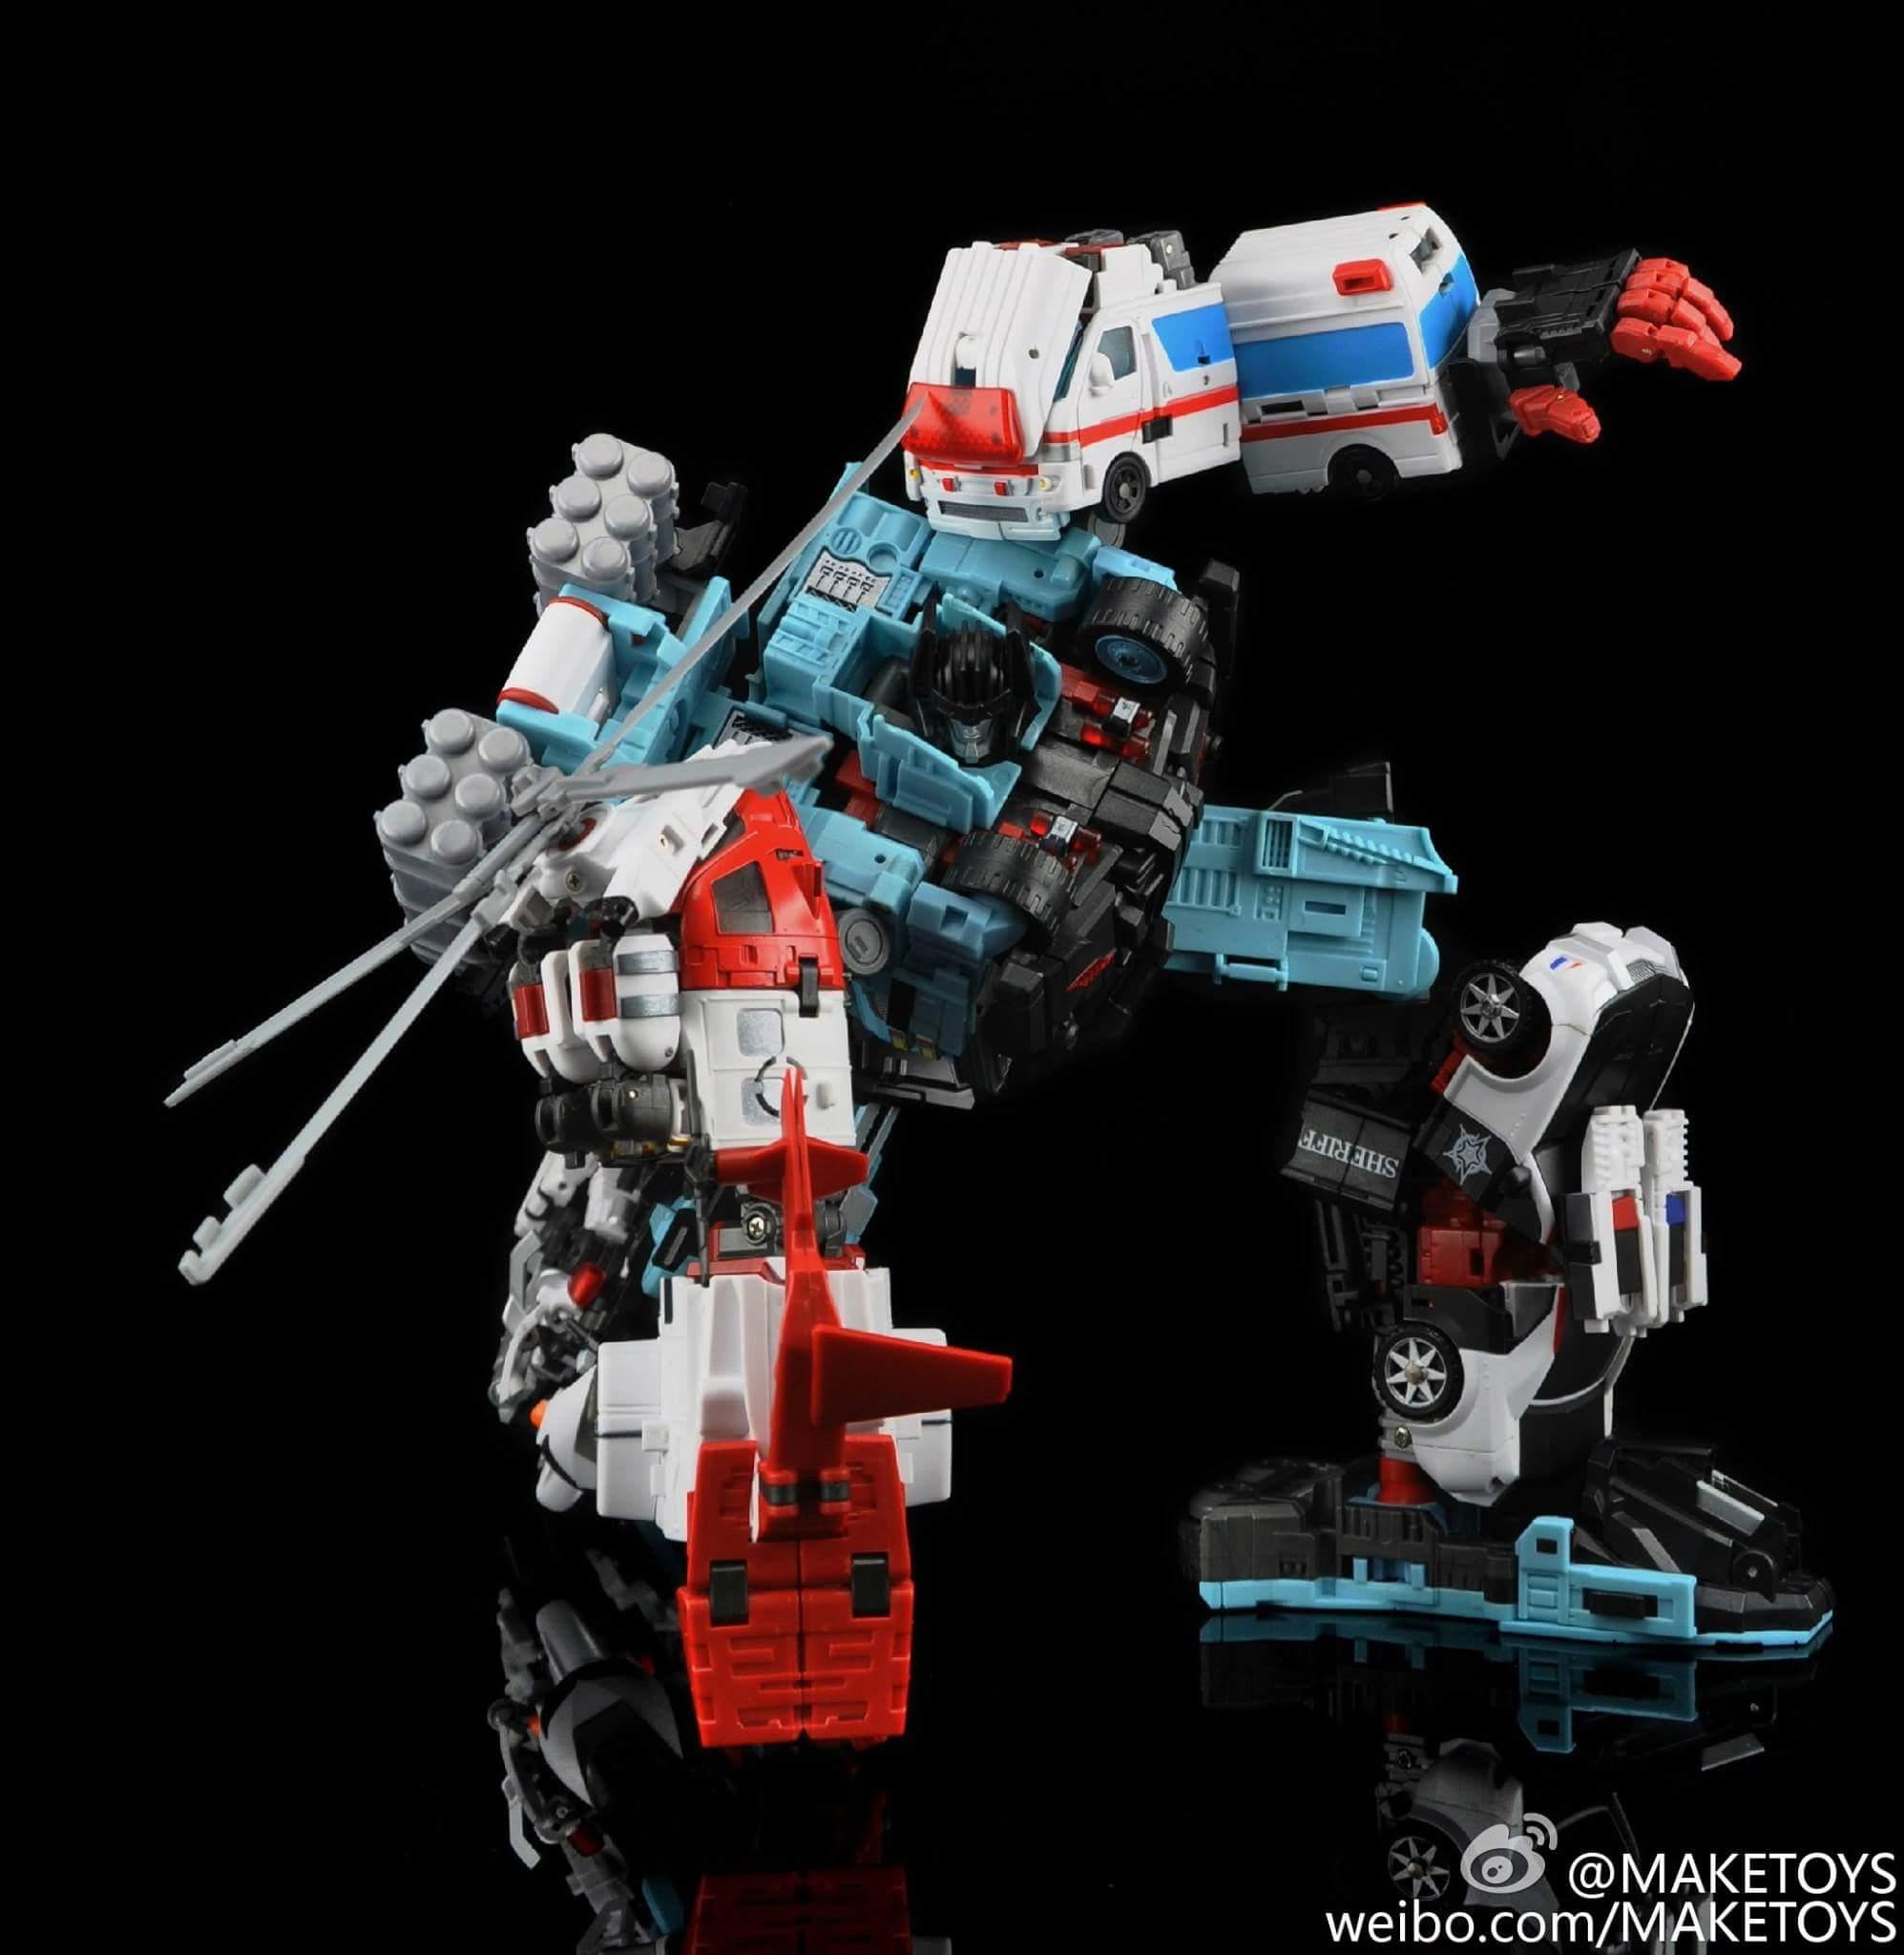 [MakeToys] Produit Tiers - Jouet MTCM-04 Guardia (aka Protectobots - Defensor/Defenso) - Page 3 TQaESsfn